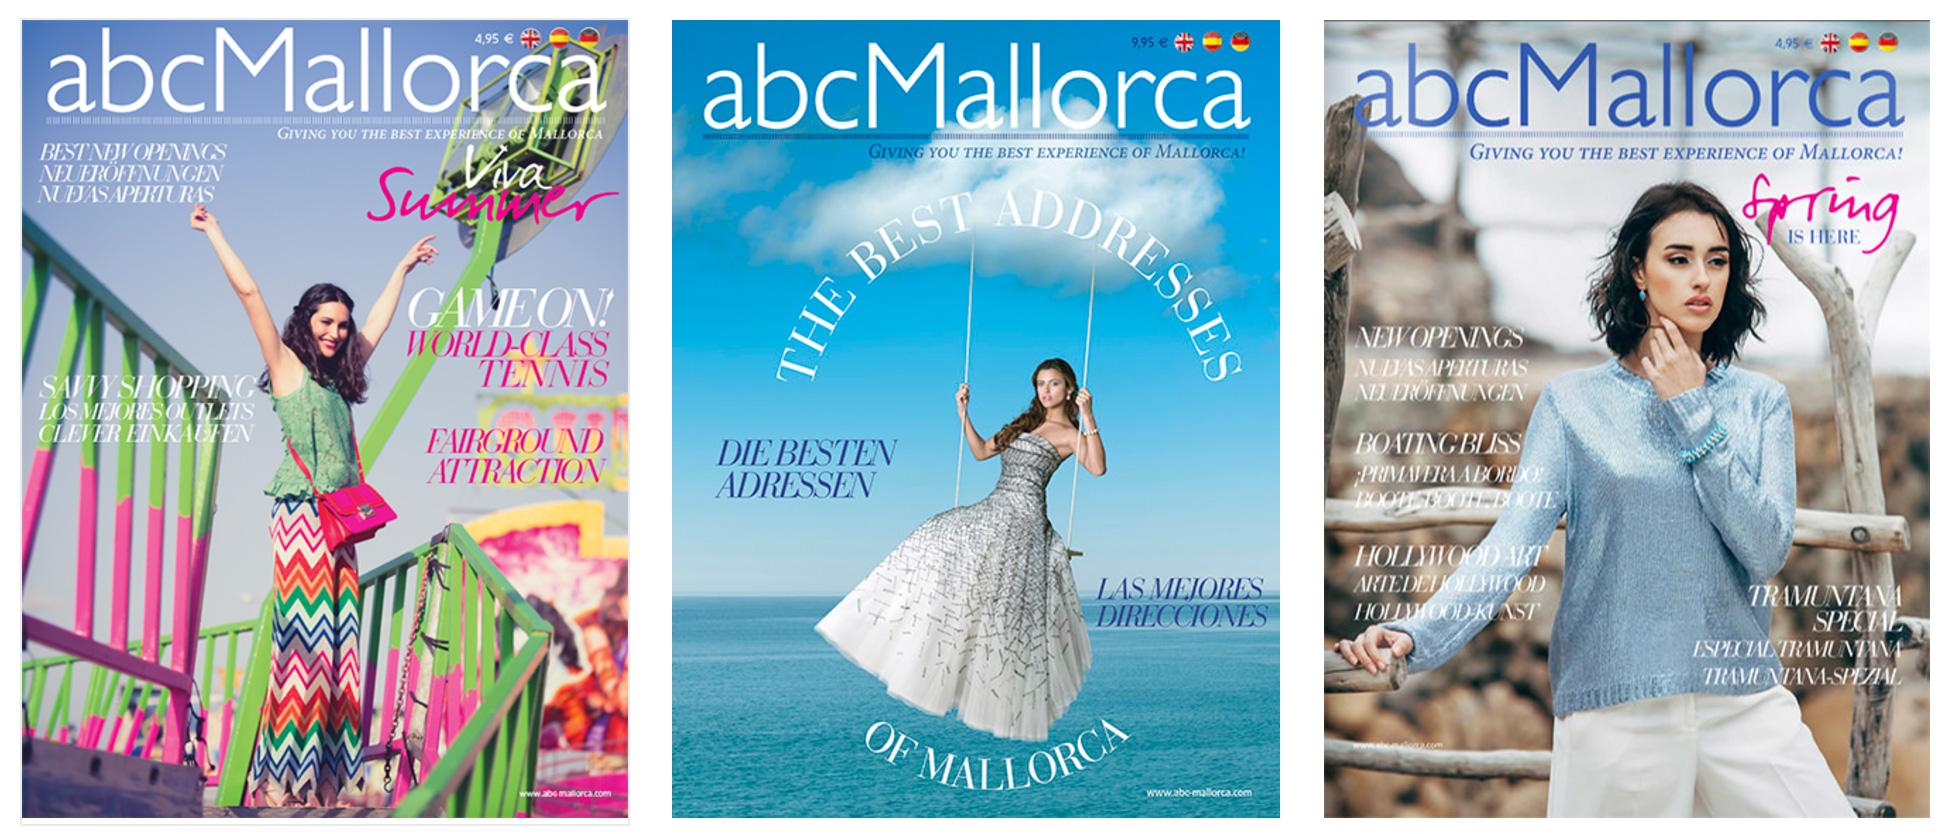 abcmallorca-magazine-covers